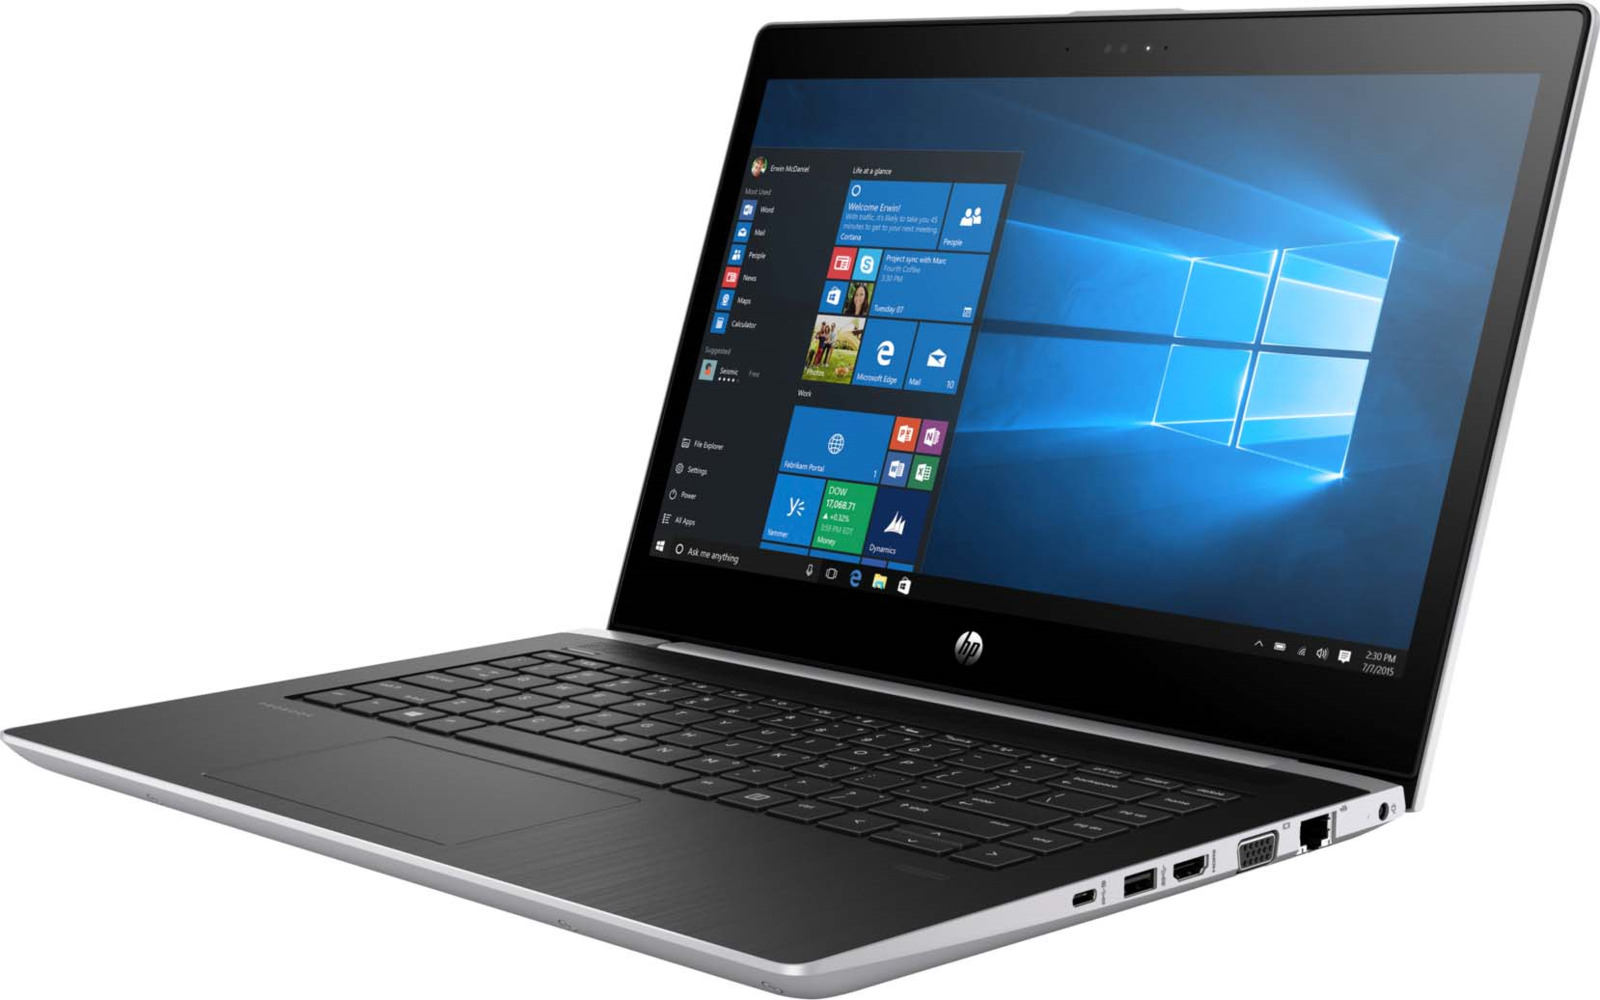 Ноутбук HP ProBook 440 G5 2SY21EA, серебристый msi original zh77a g43 motherboard ddr3 lga 1155 for i3 i5 i7 cpu 32gb usb3 0 sata3 h77 motherboard